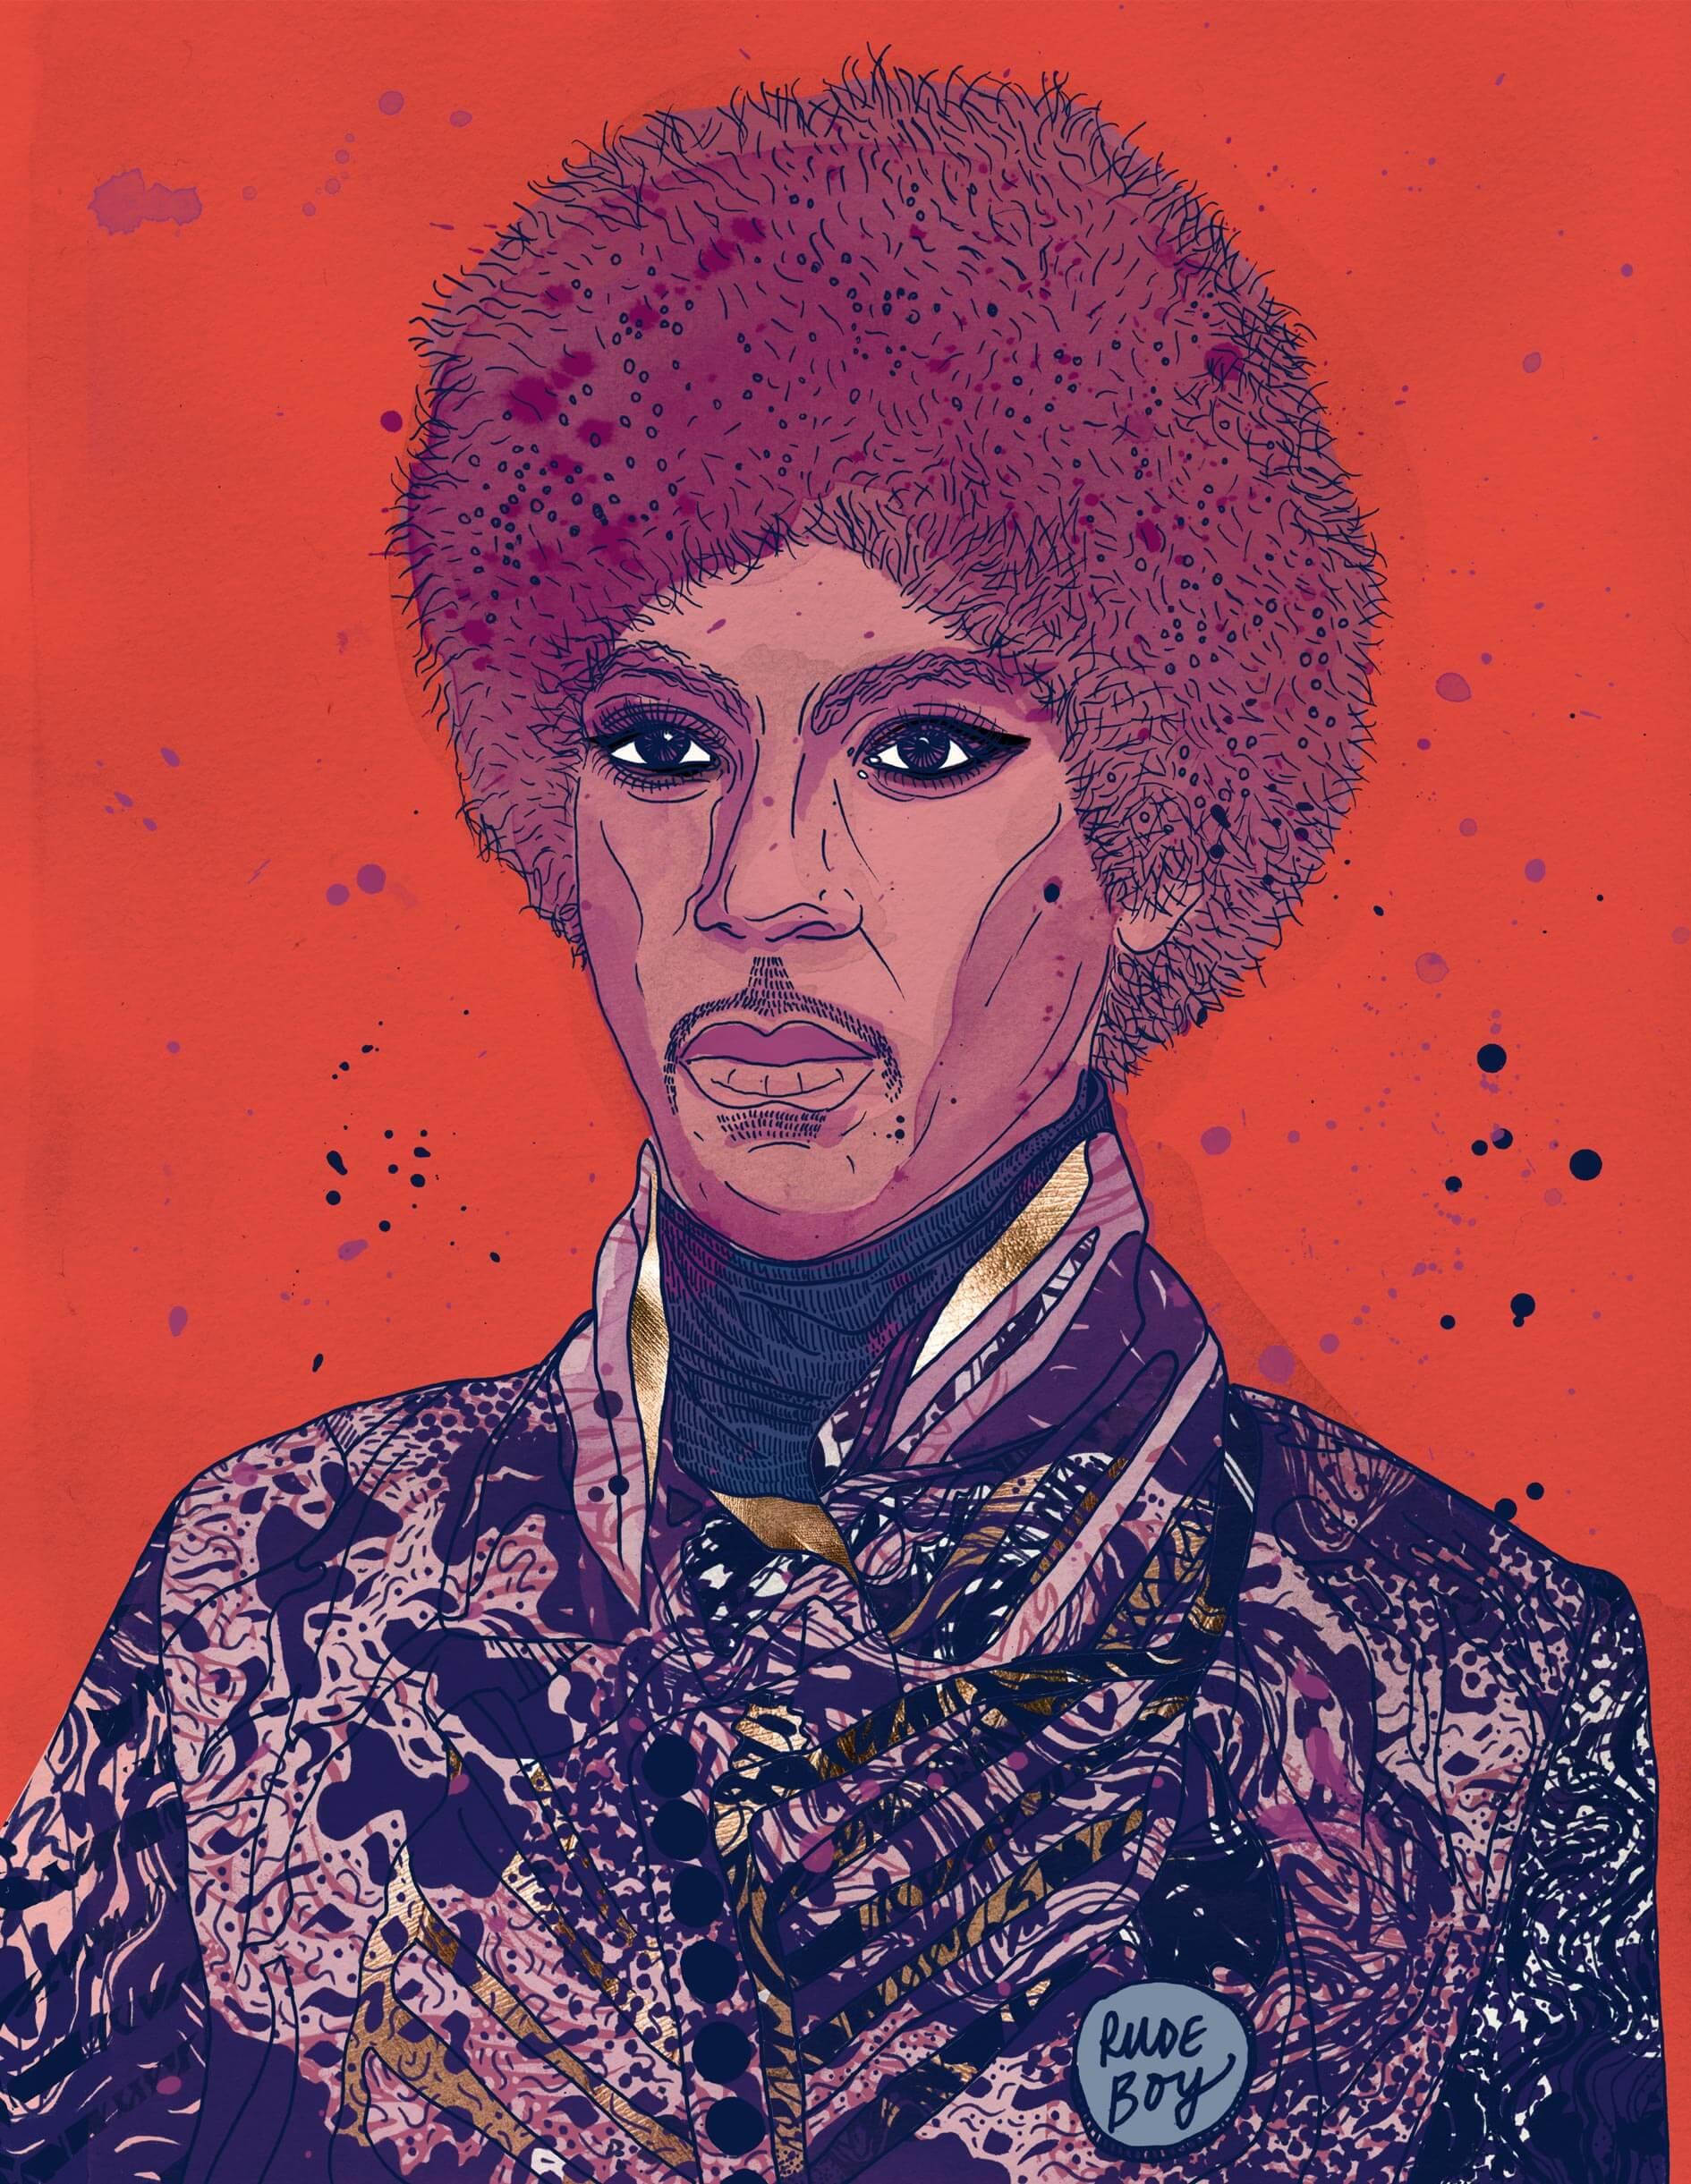 triplej_Annual2016_PortraitIllustration_Prince_10Cols